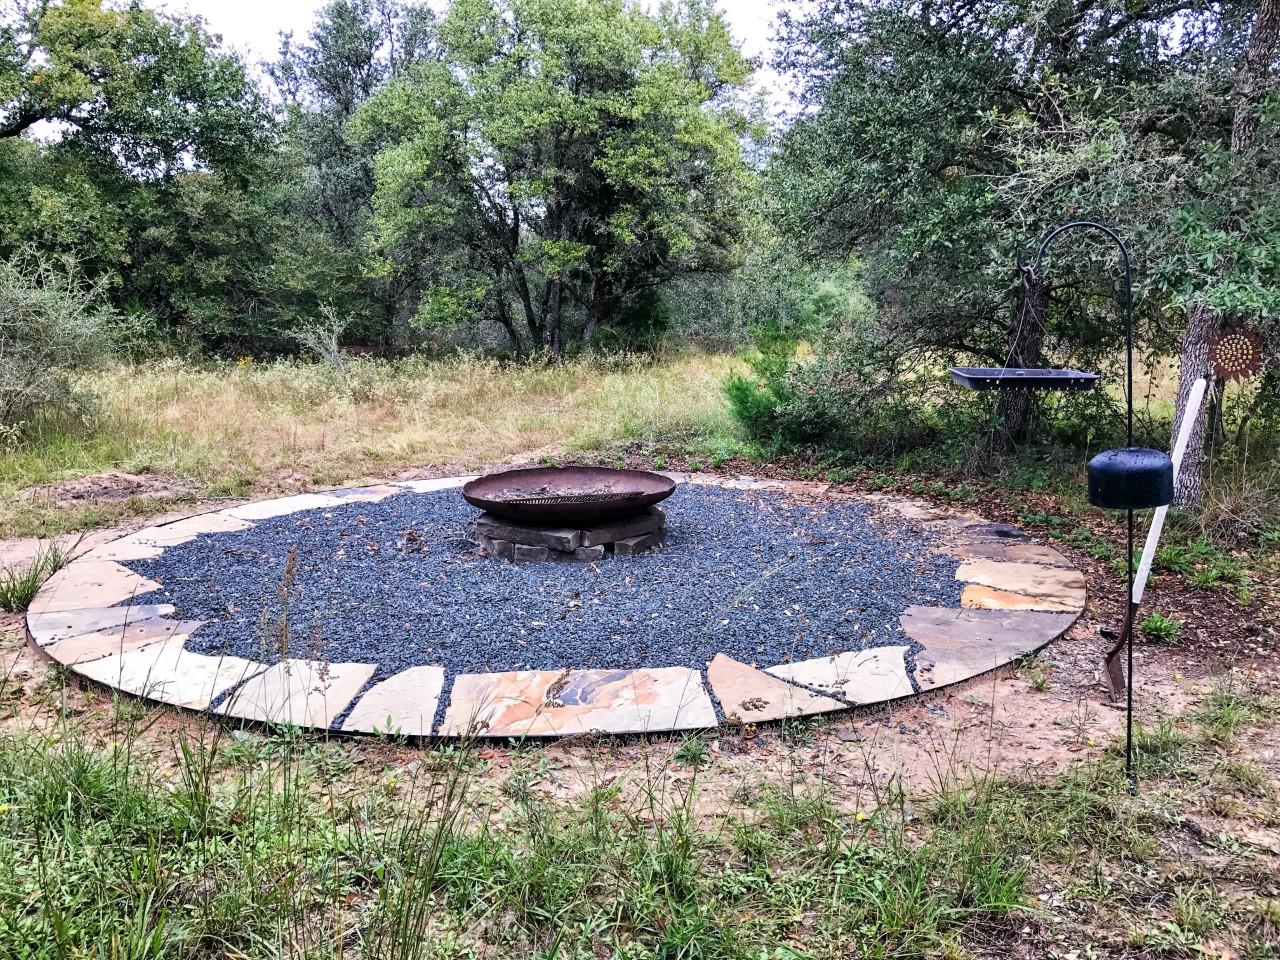 ranch landscaping, modern ranch, texas ranch, texas landscaping, arid landscaping, texas native plants, blackstar gravel, modern landscaping, rh factor, grove hill farm